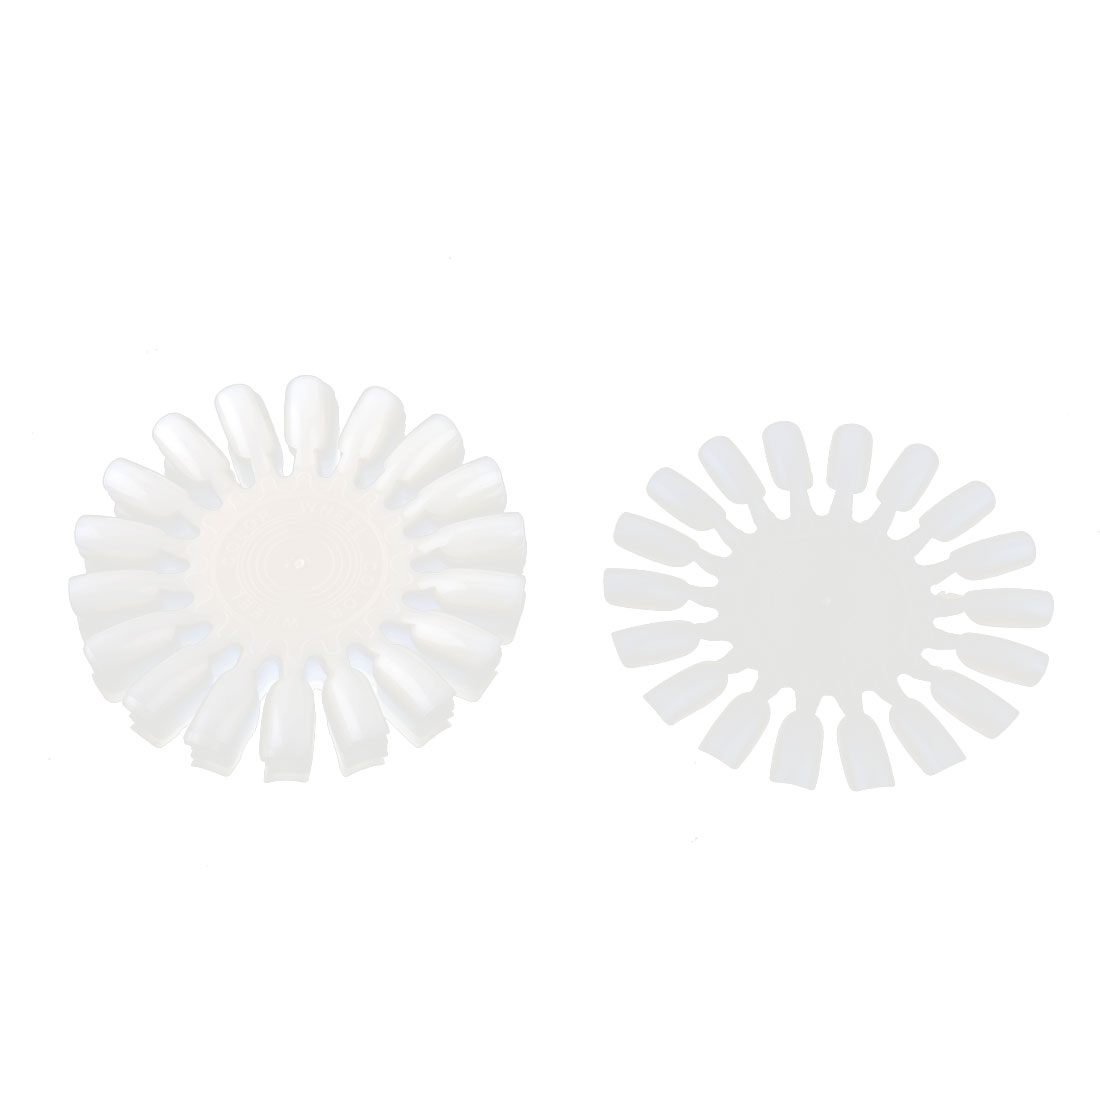 Makeup Plastic Fan Design Wearable False Fingernail Nail Tips Card Plate White 10pcs